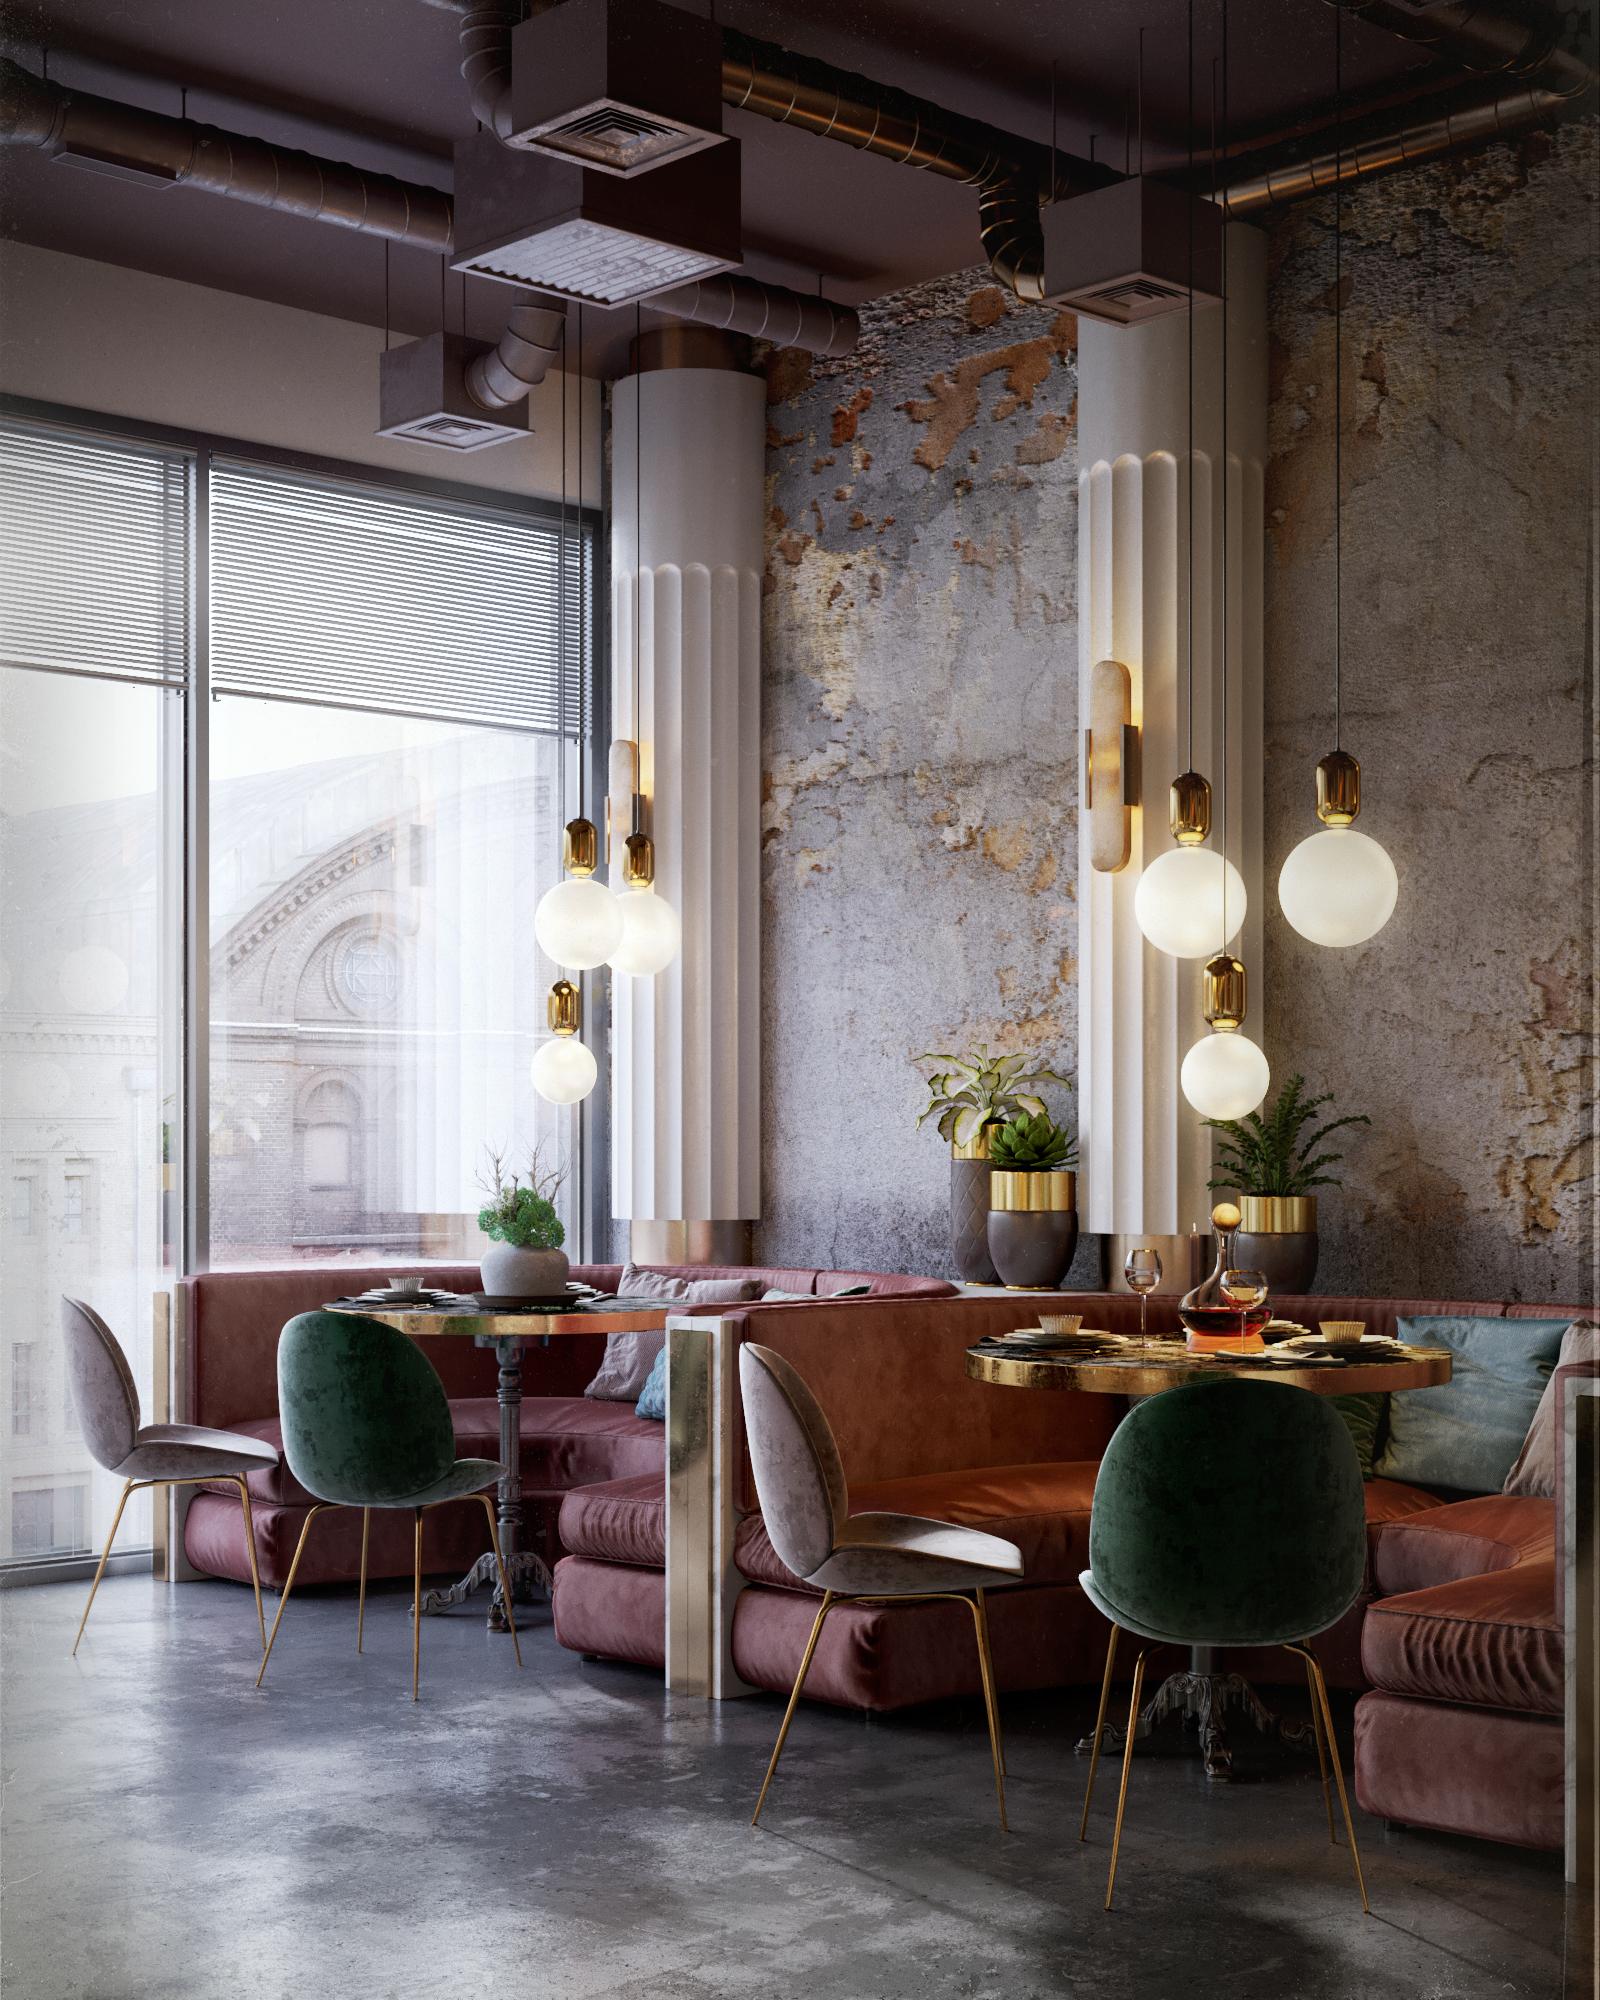 Restaurant Design - by Maxim Tsiabus